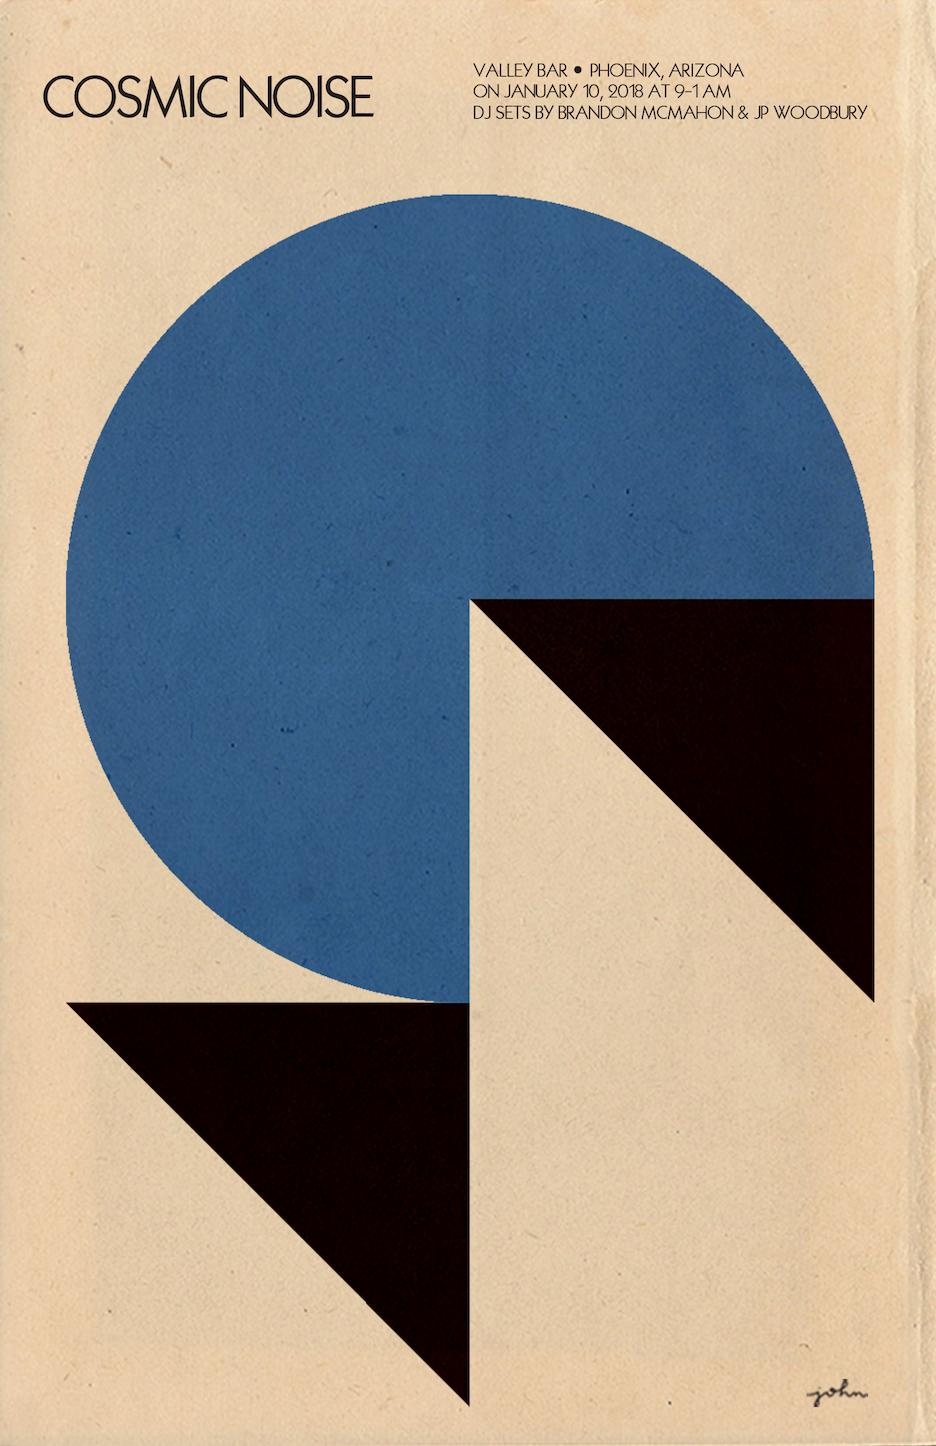 topmatter poster for brandon mcmahon jason woodbury art in